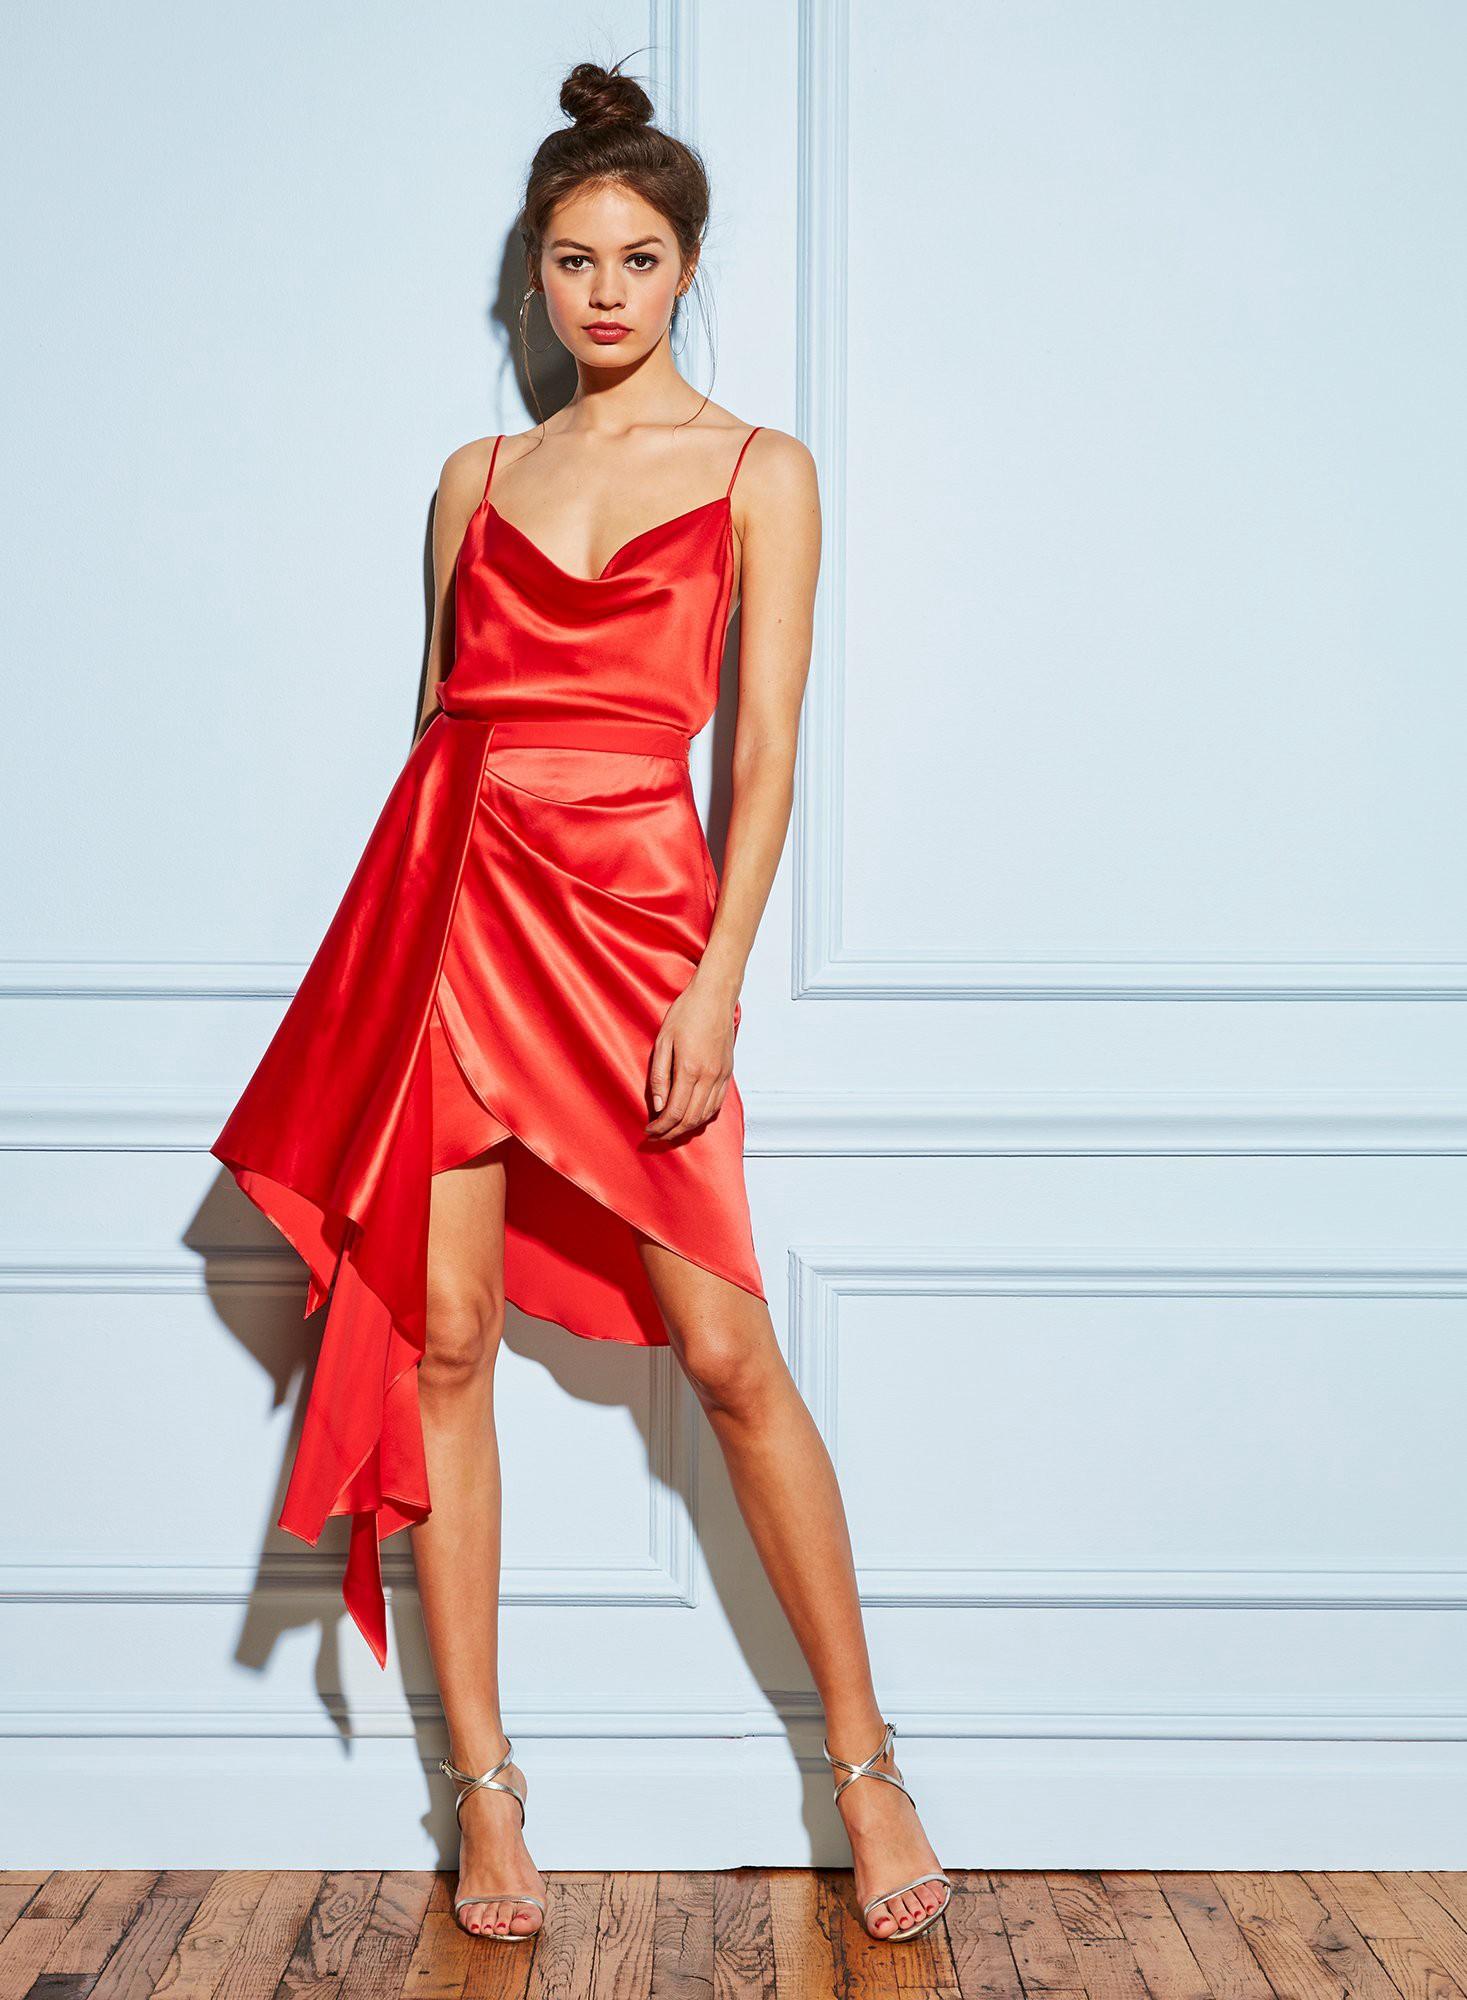 d341699f5cbd Fleur Du Mal Cowl Neck Spaghetti Strap Cami - xs Red | Products ...